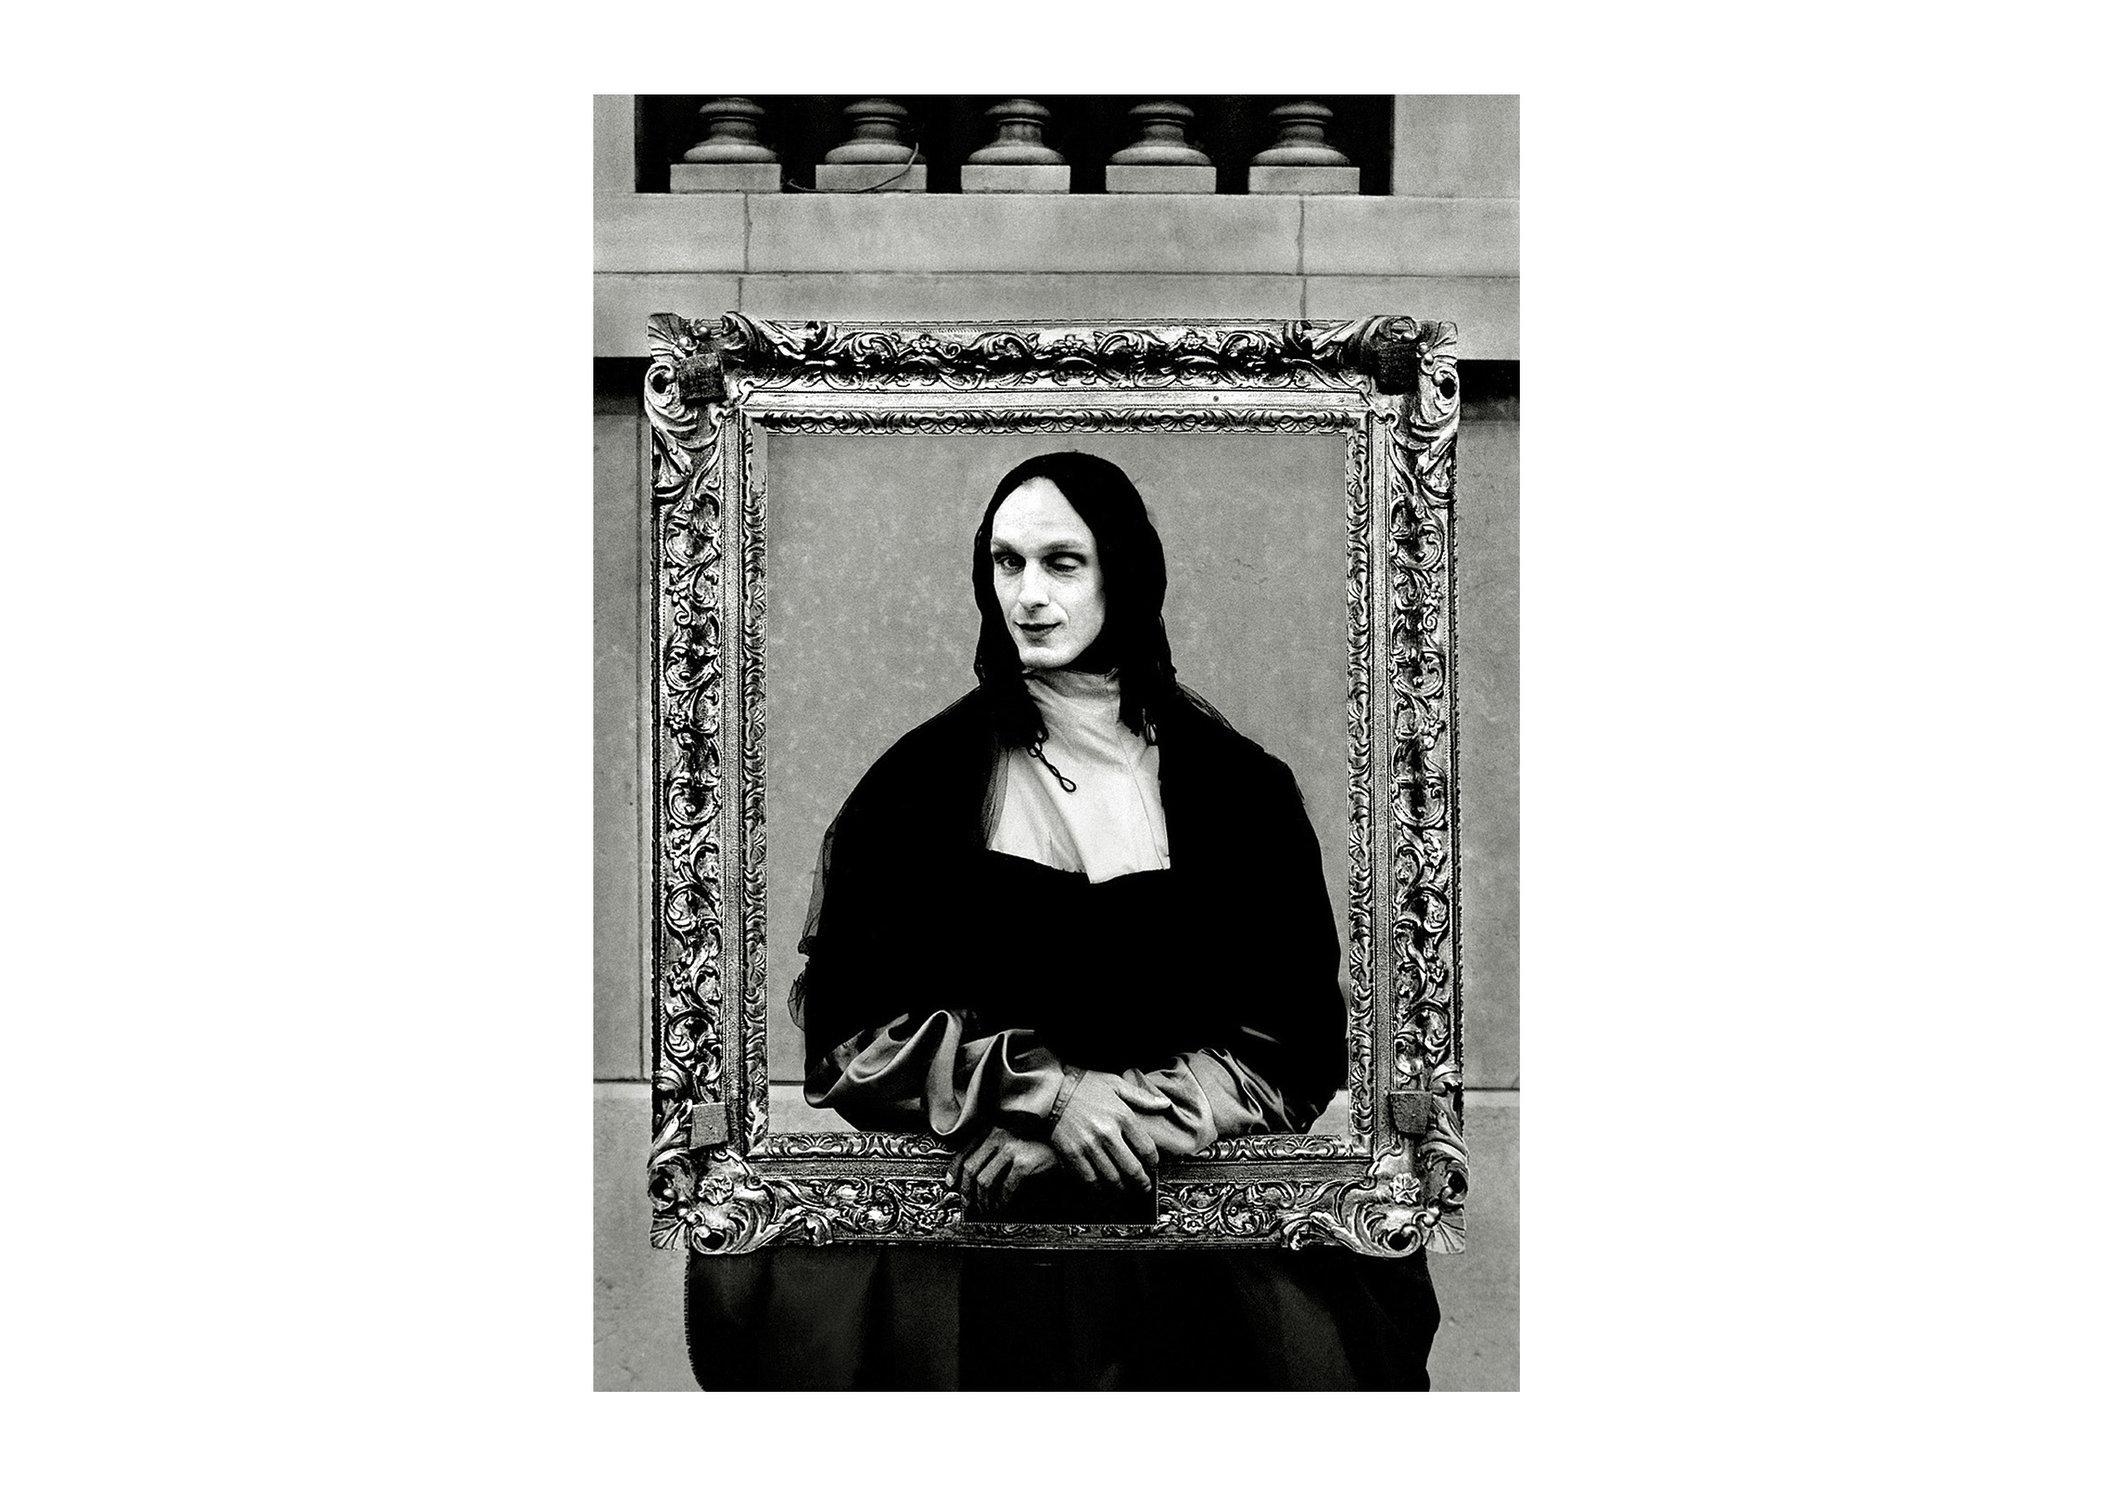 Mona Lisait